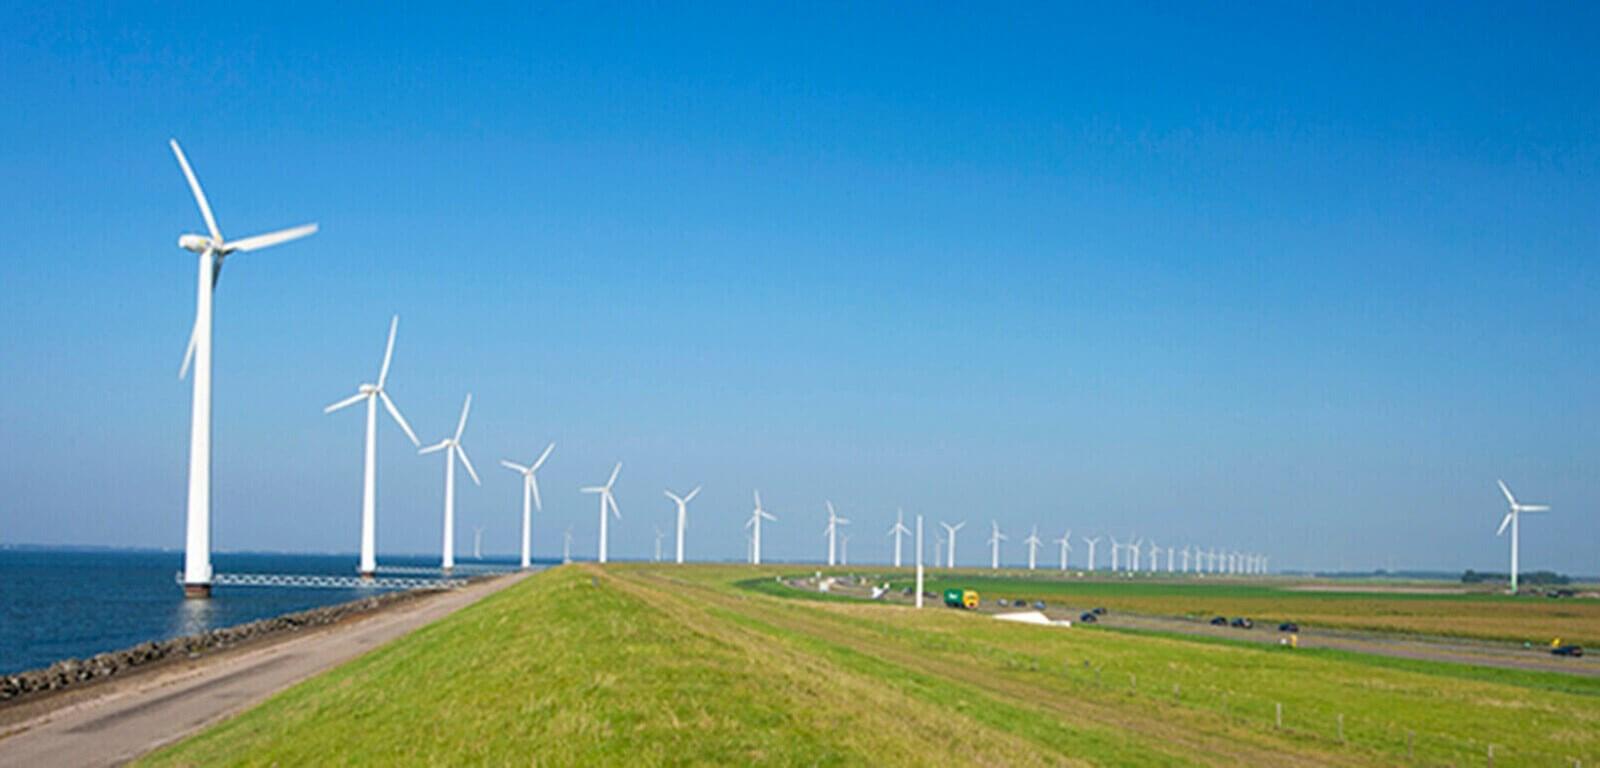 Podcast BNR Energie over energietransitie